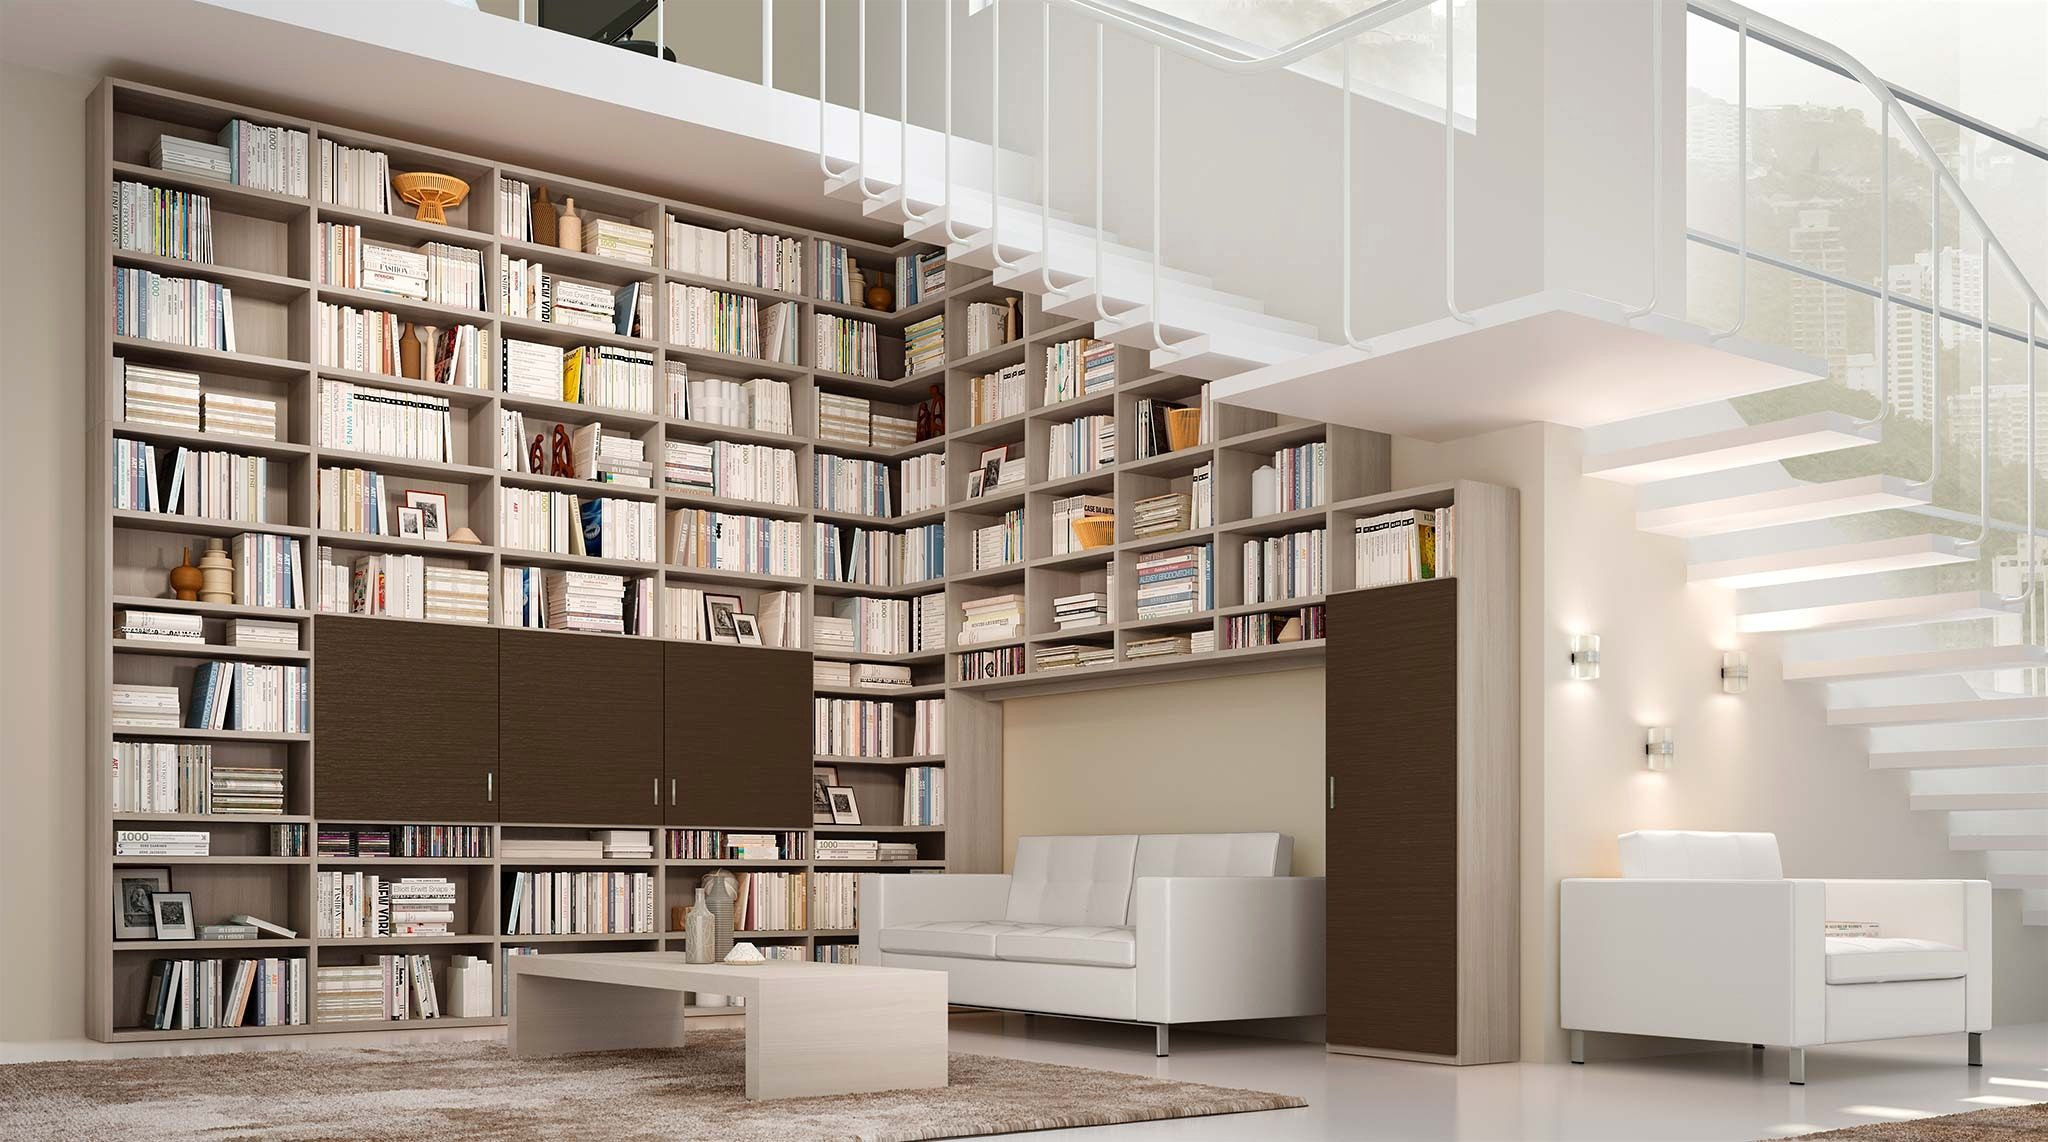 Armadi A Muro Mondo Convenienza : Libreria a muro mondo convenienza con mobili per soggiorno